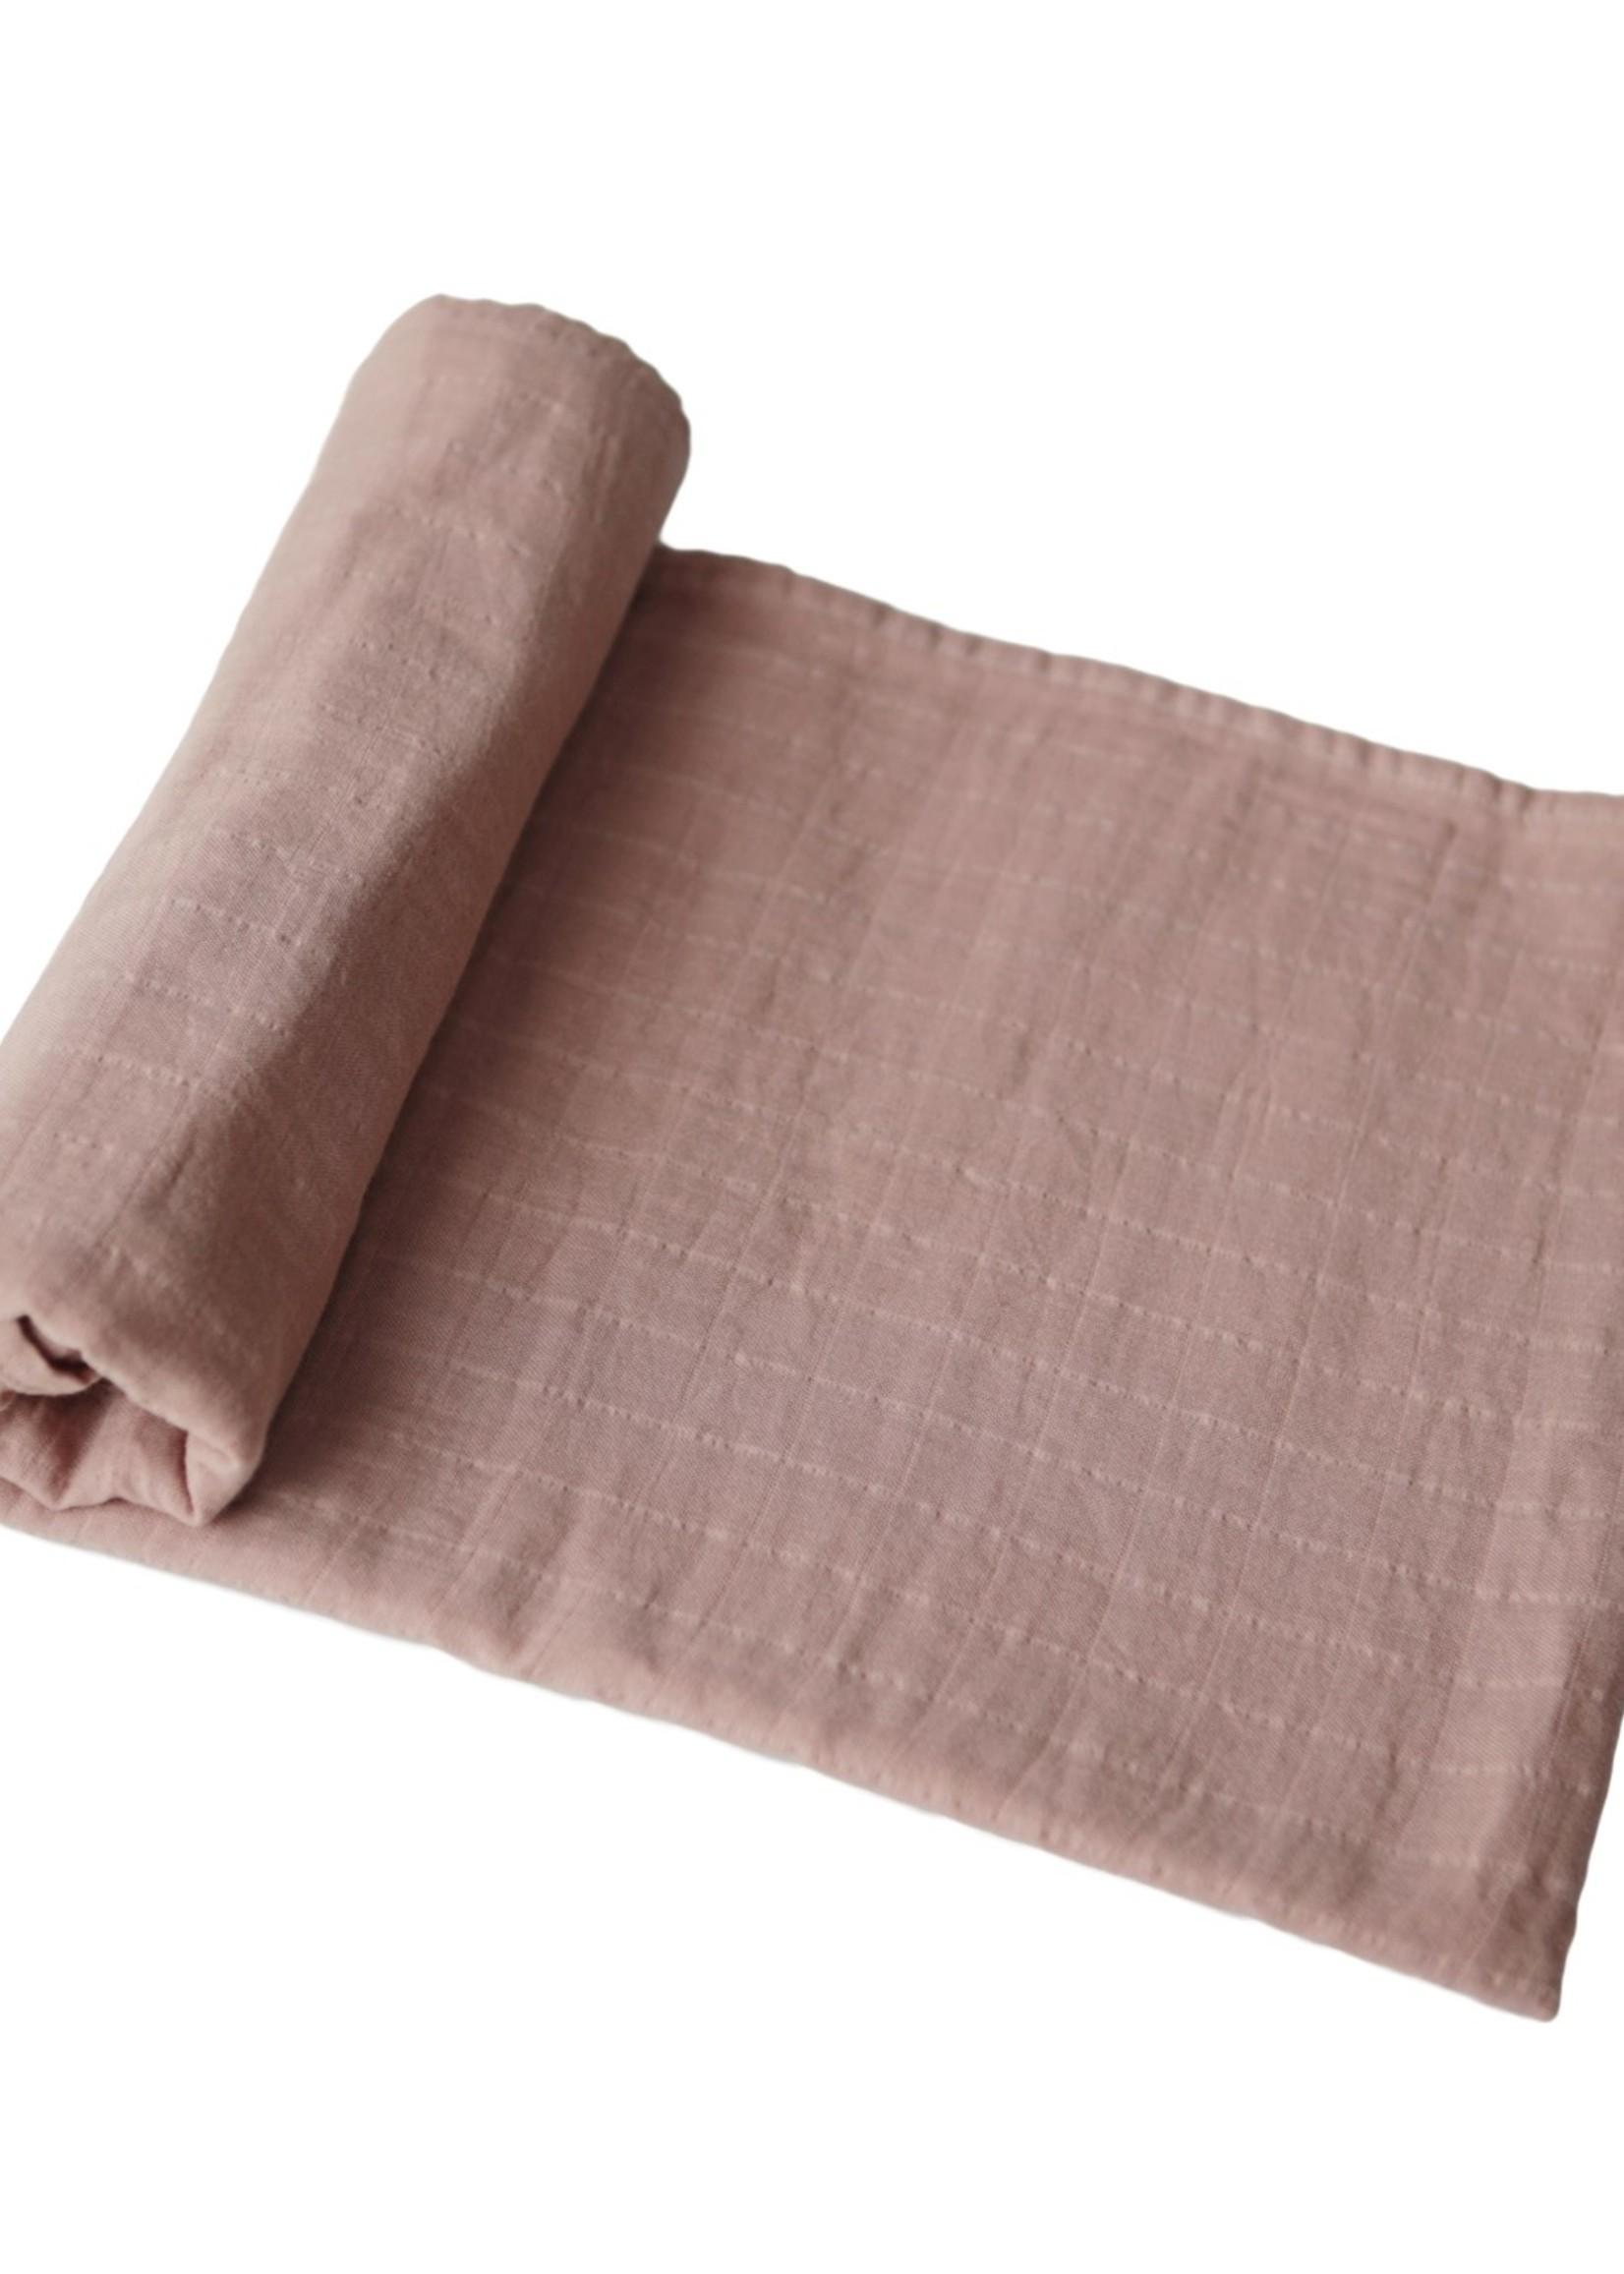 Mushie Muslin Swaddle Blanket Organic Cotton - Natural